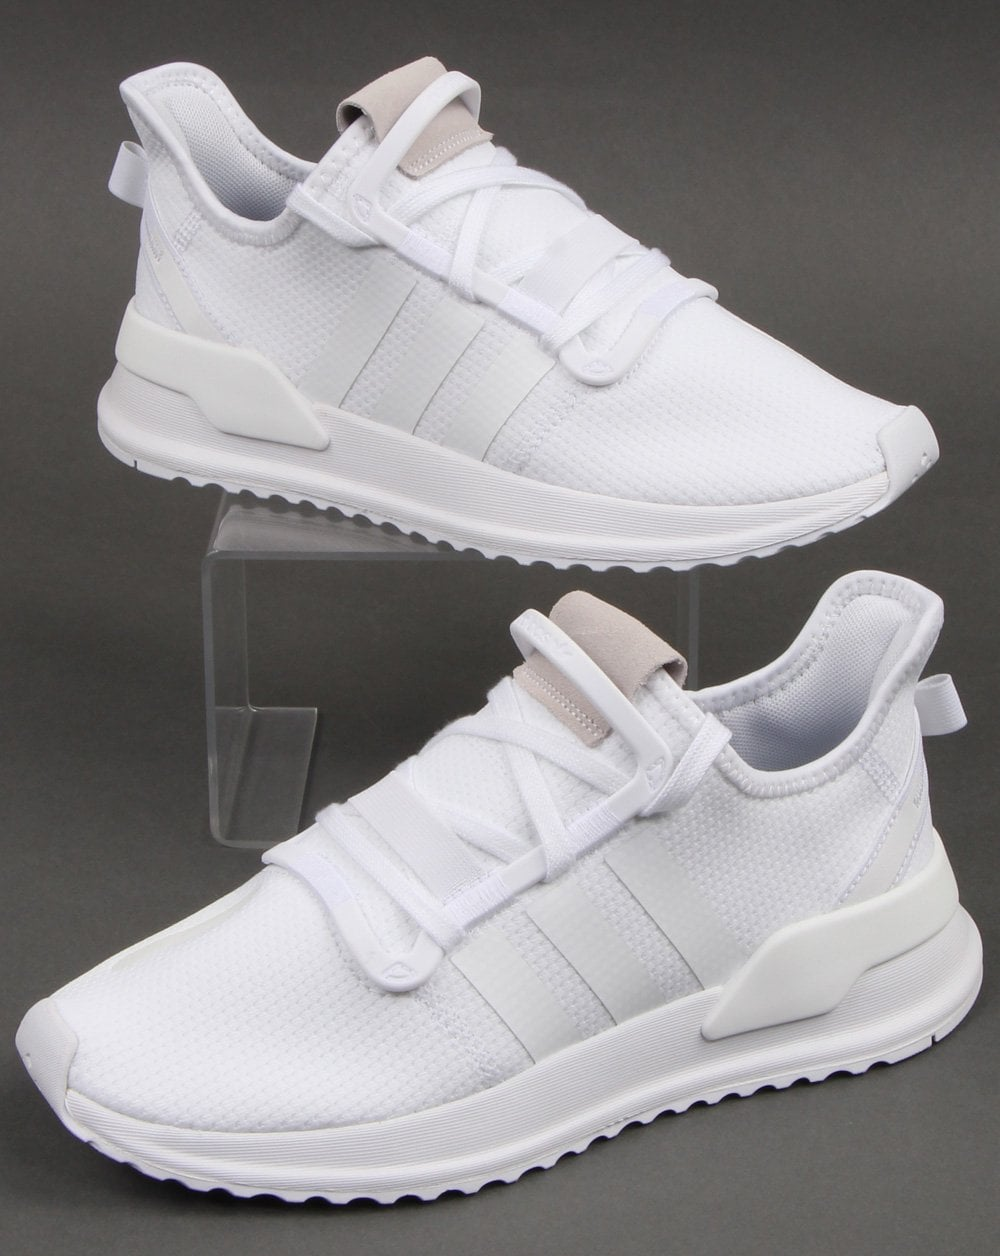 Adidas U_path Run Trainers White. Shop